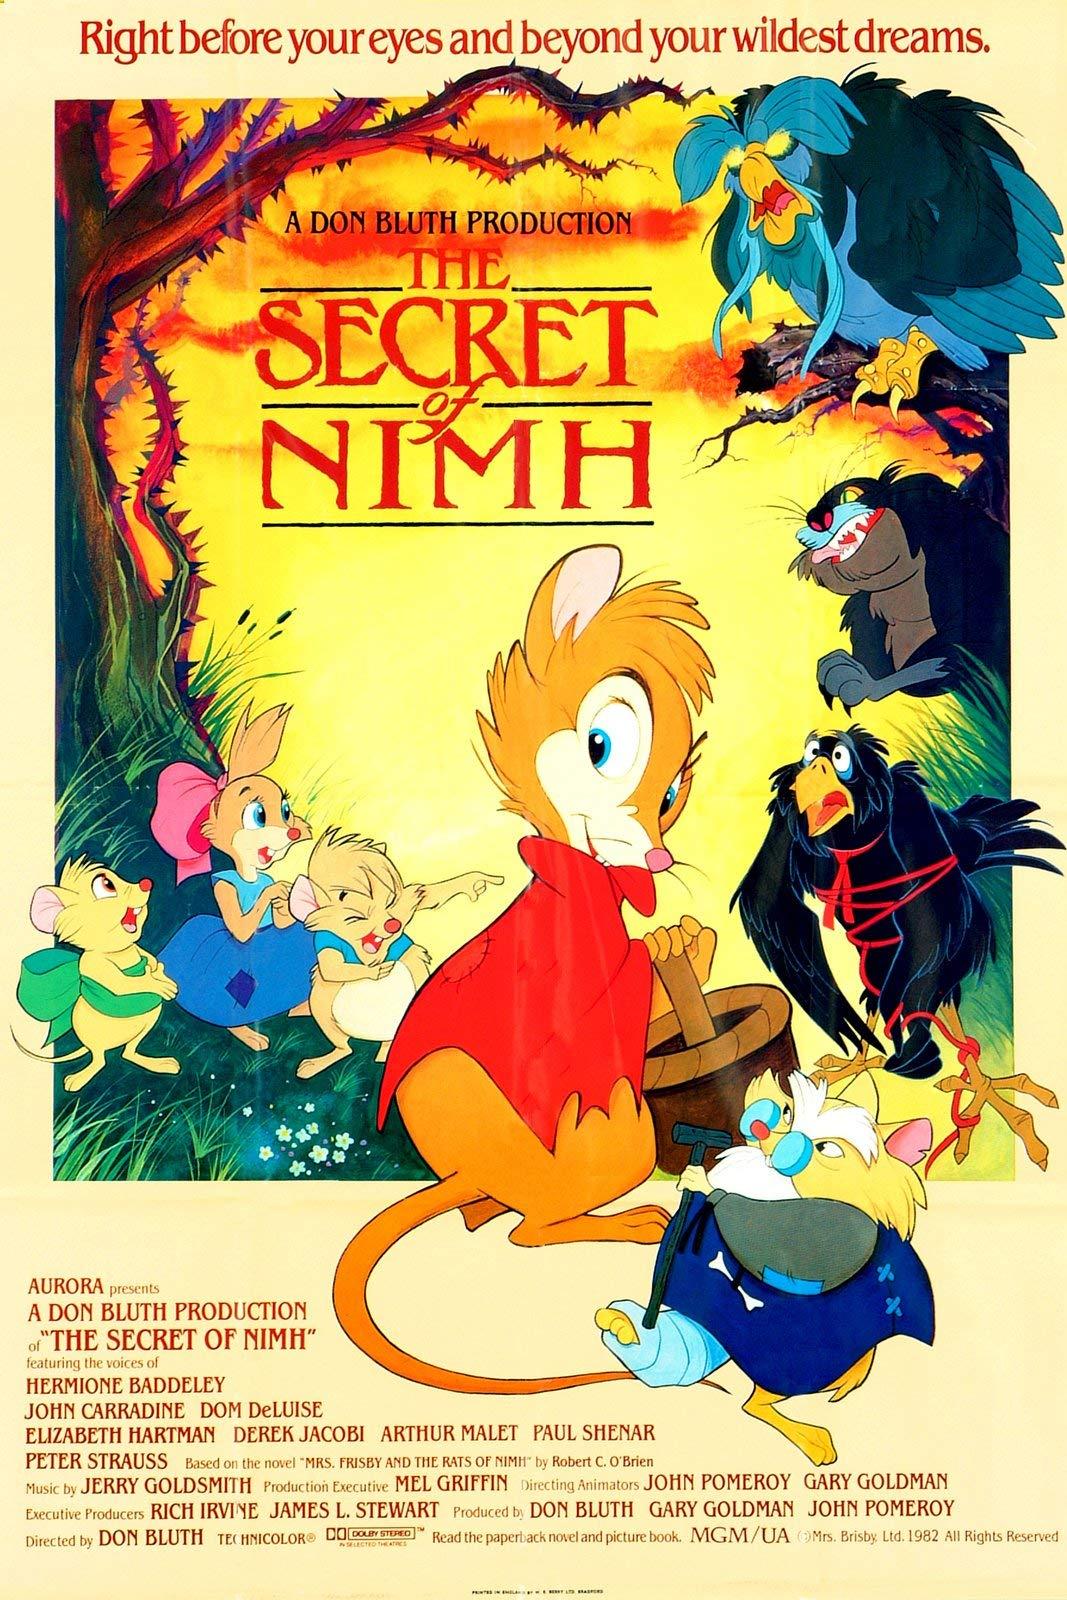 The Secret of NIMH (1982) starring Elizabeth Hartman, Peter Strauss